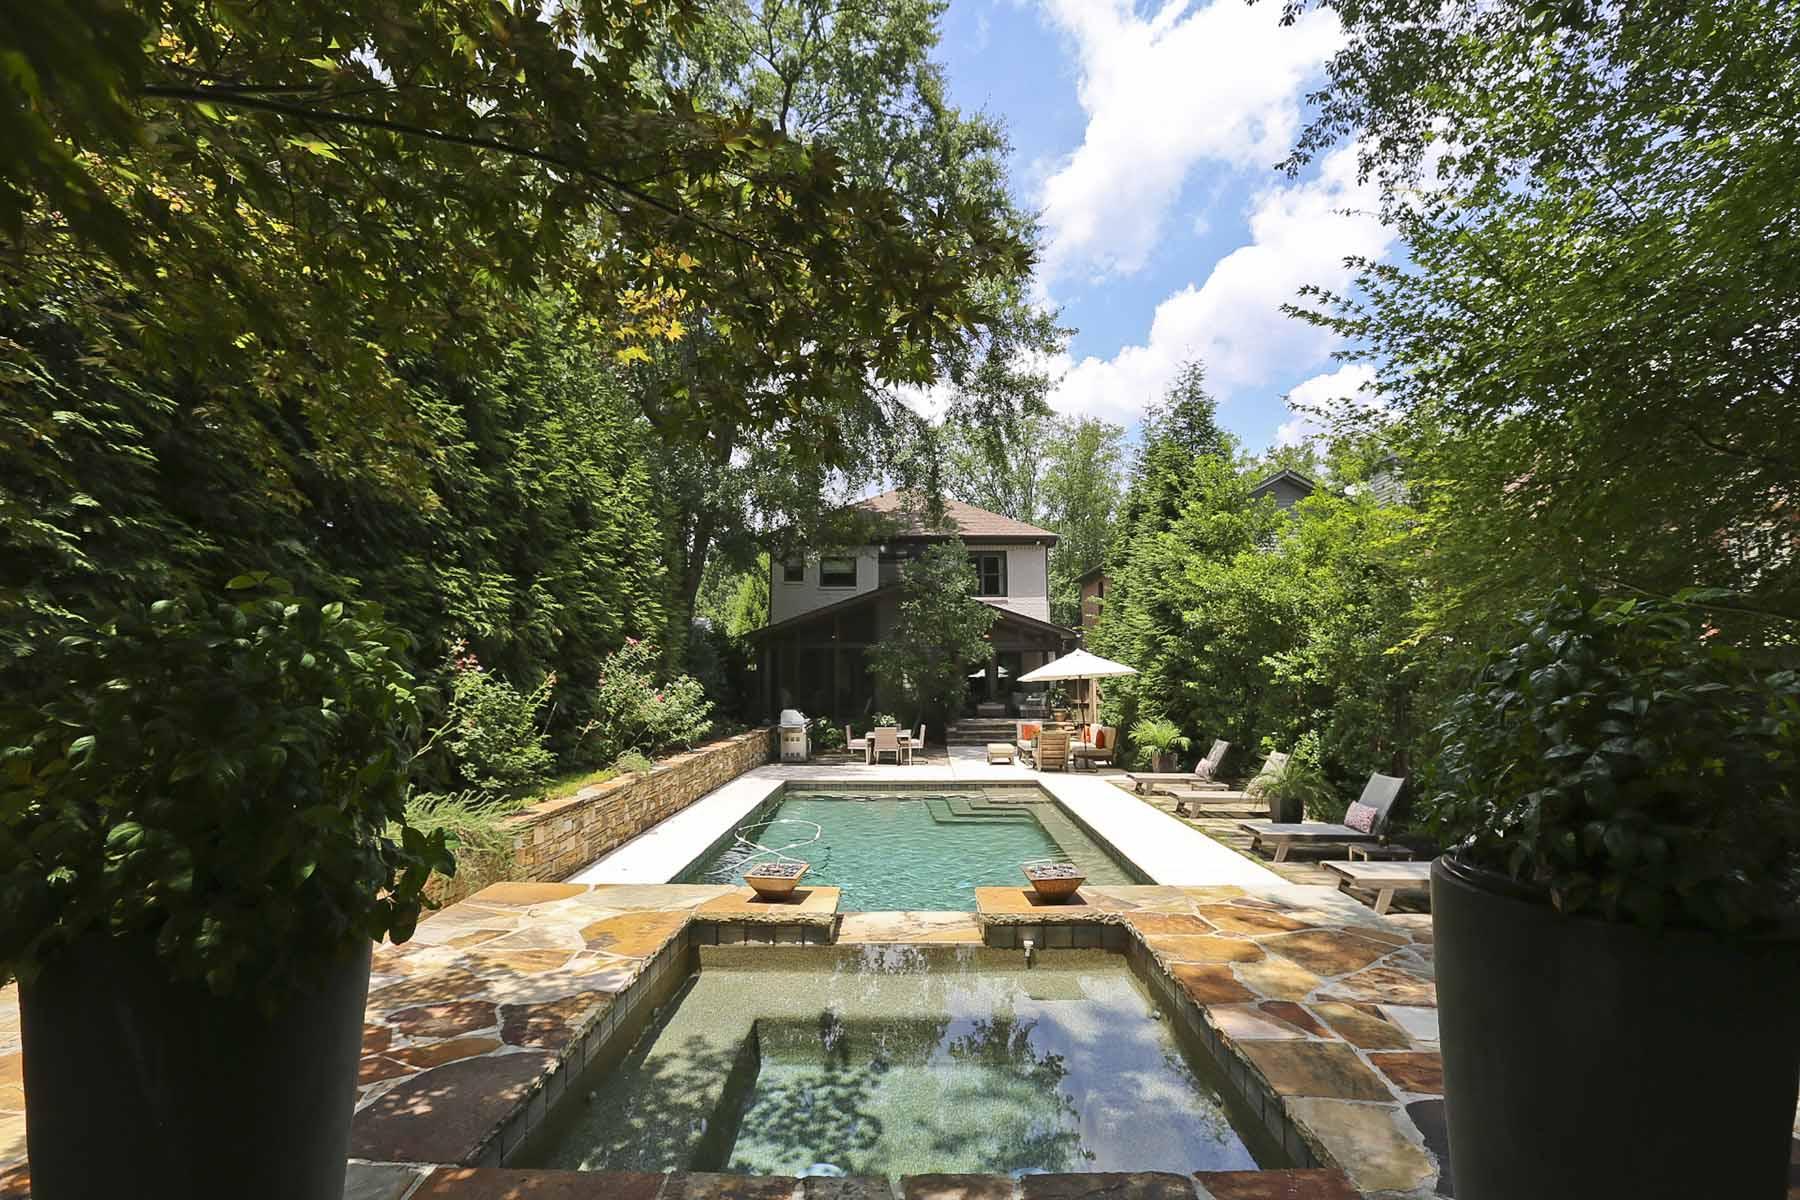 Casa Unifamiliar por un Venta en Stunning Brookhaven Residence 1269 Sylvan Circle NE Atlanta, Georgia 30319 Estados Unidos